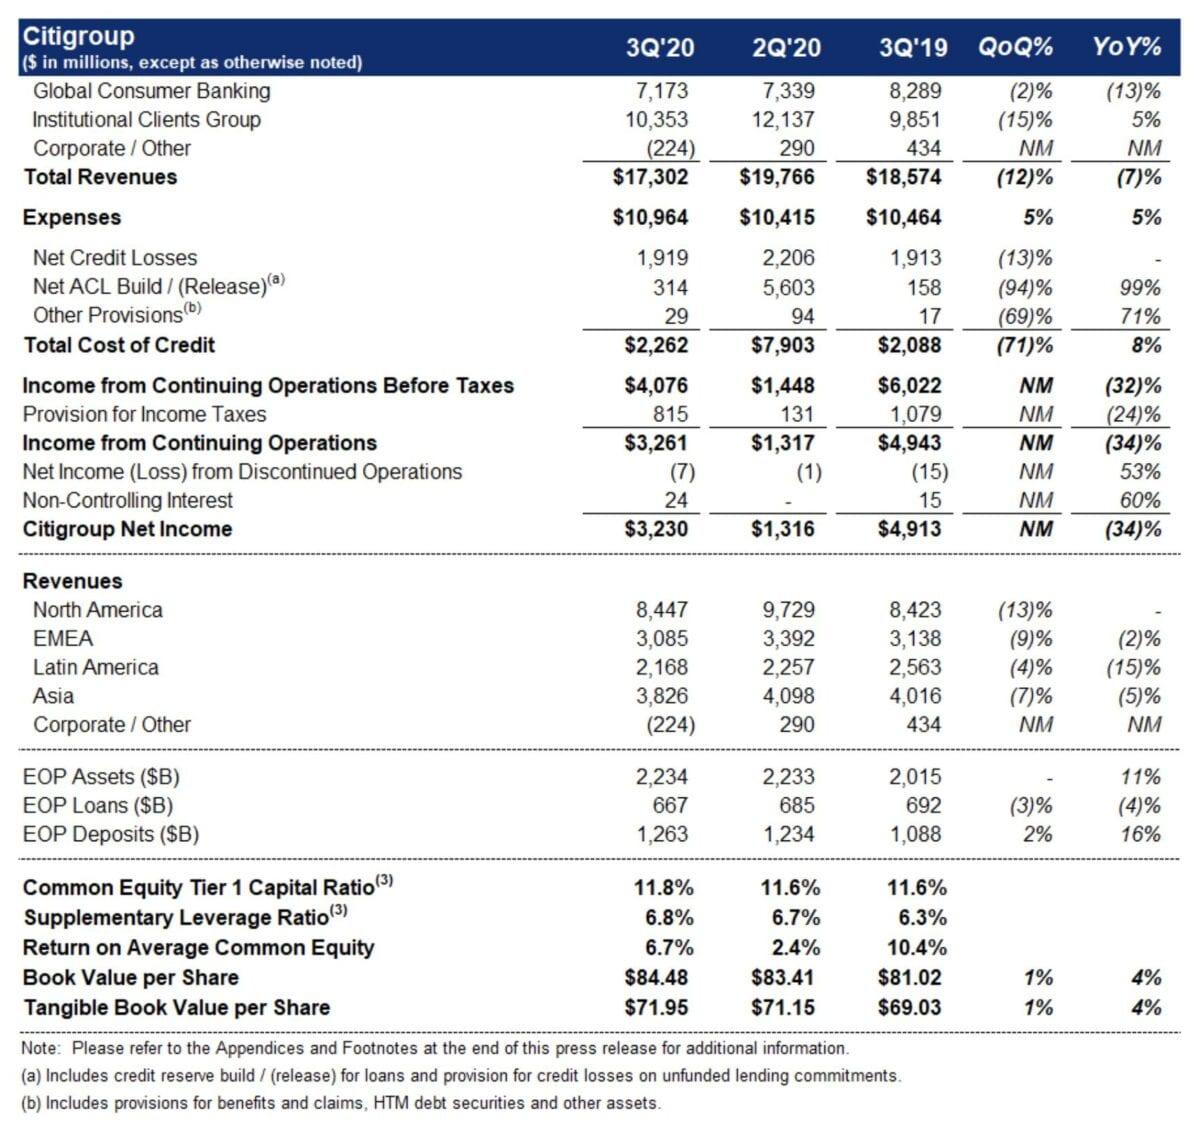 Citigroup-Quartalszahlen im Detail